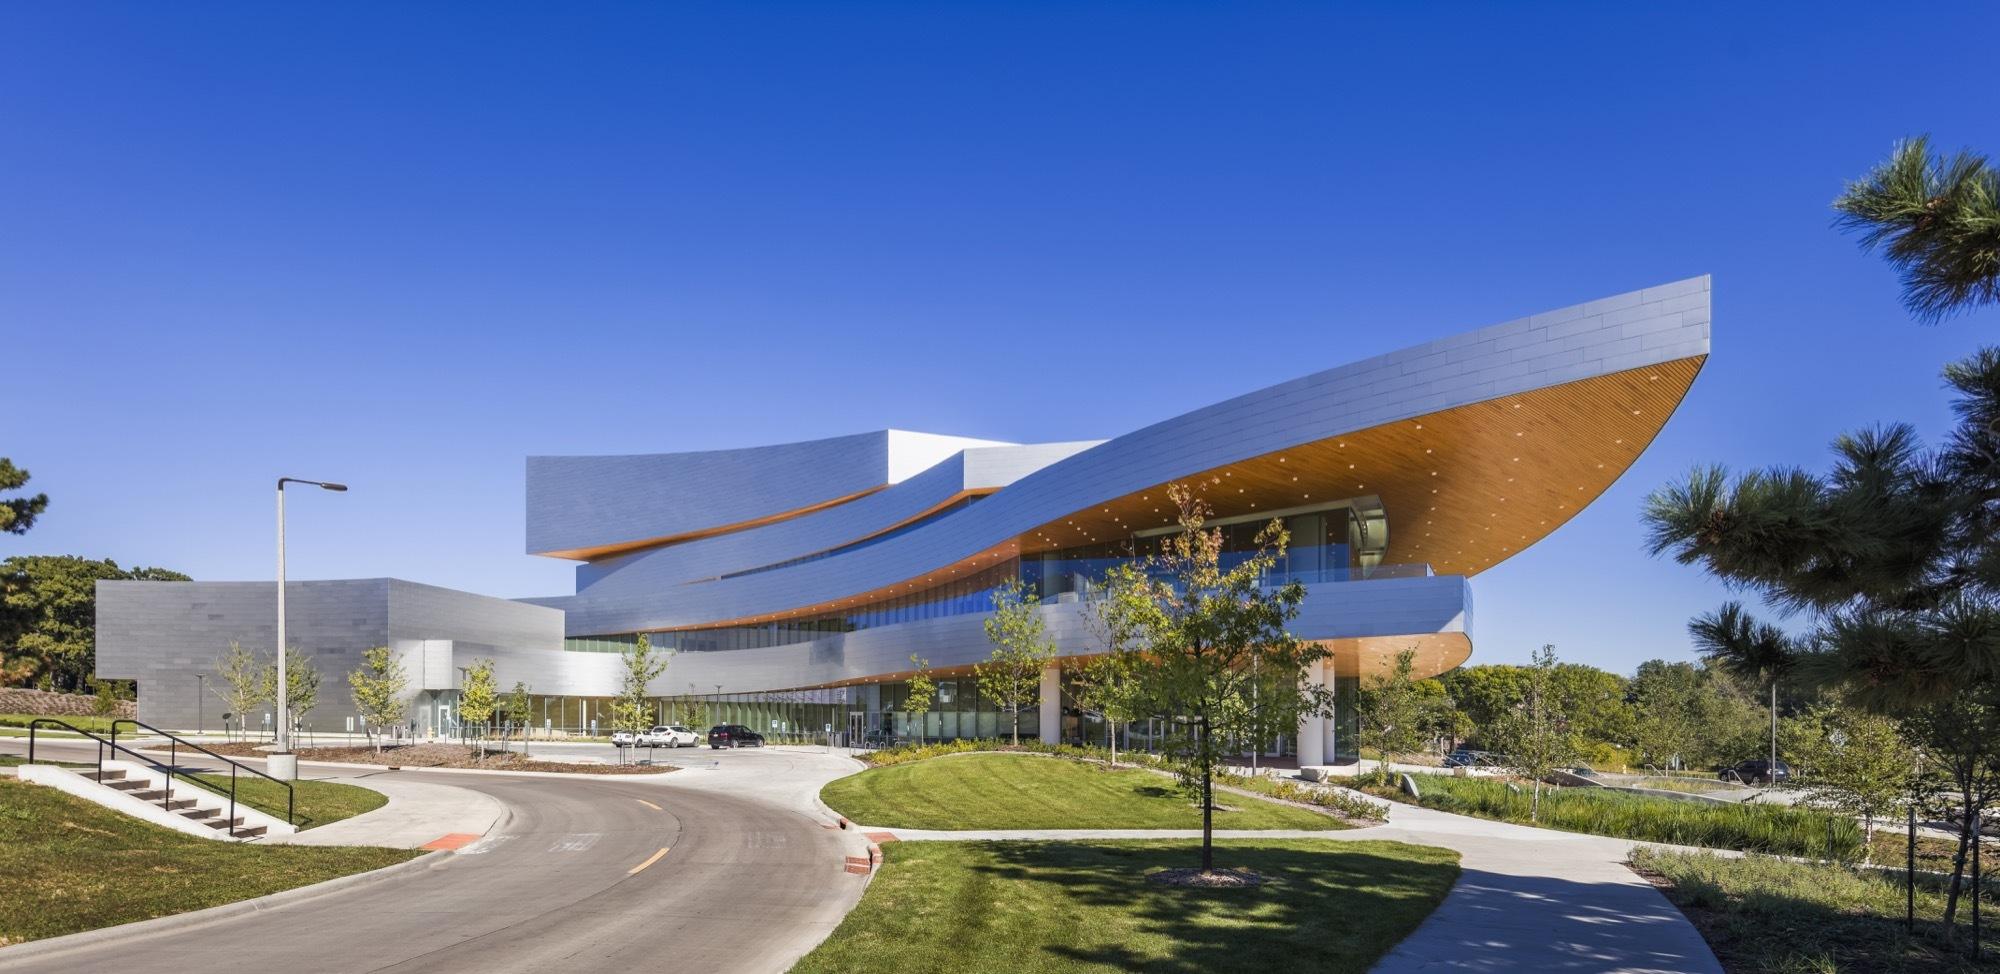 Hancher Auditorium Pelli Clarke Pelli Architects Archdaily